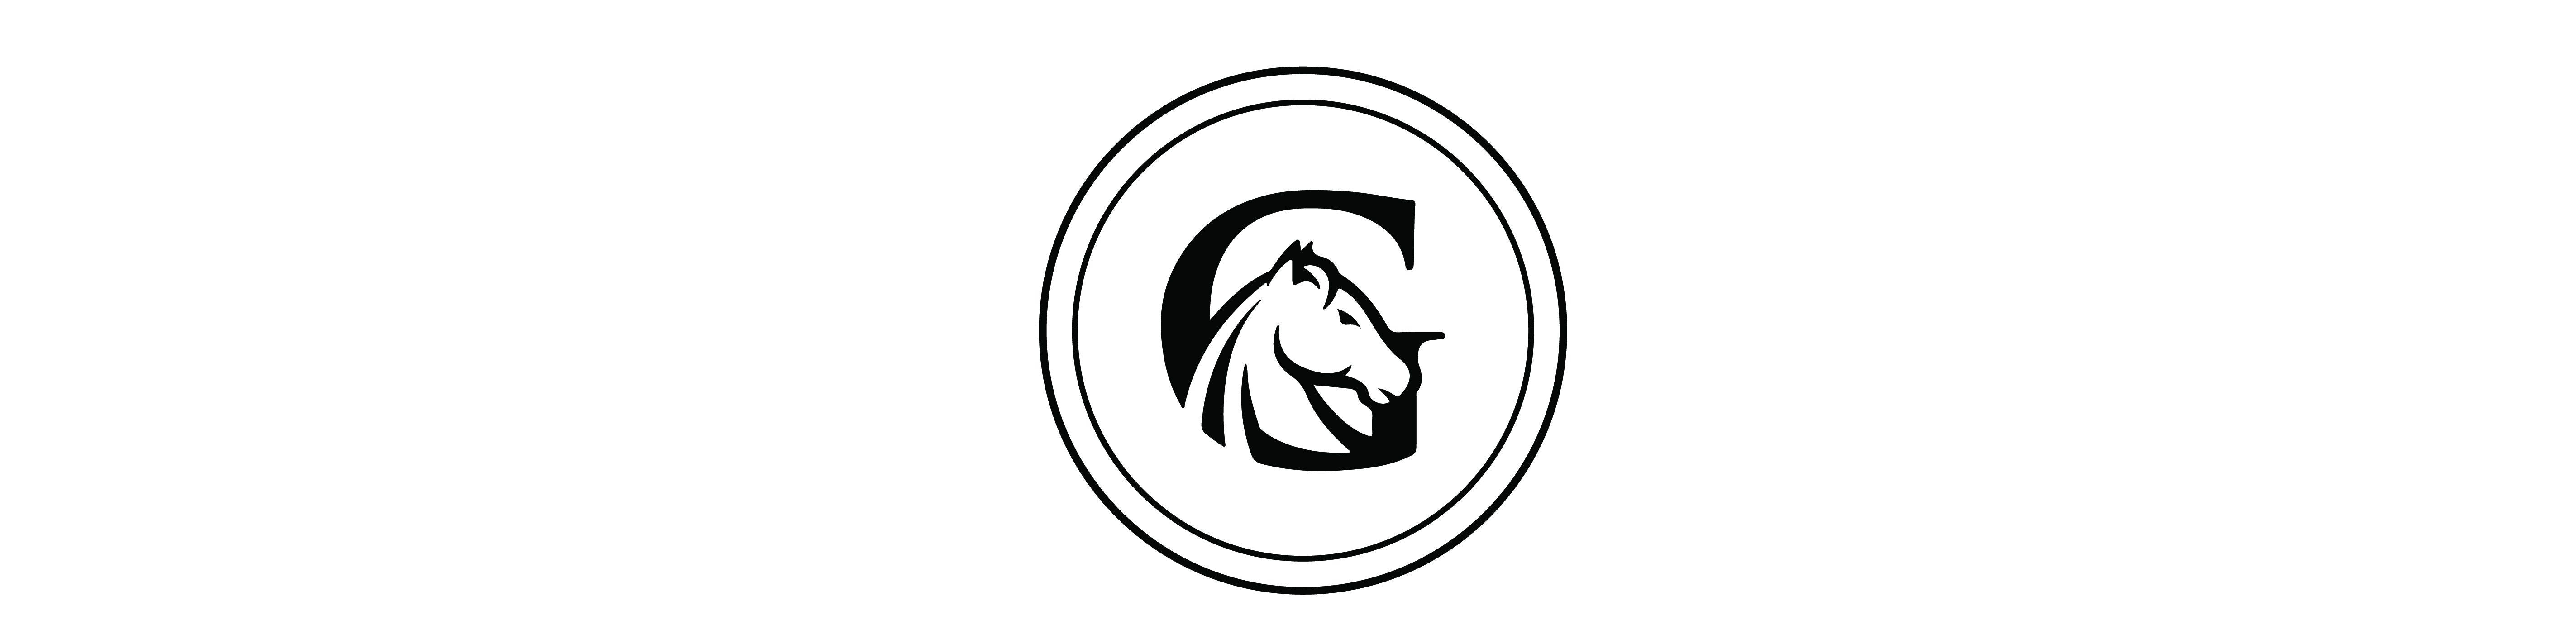 Graceland Equestrian